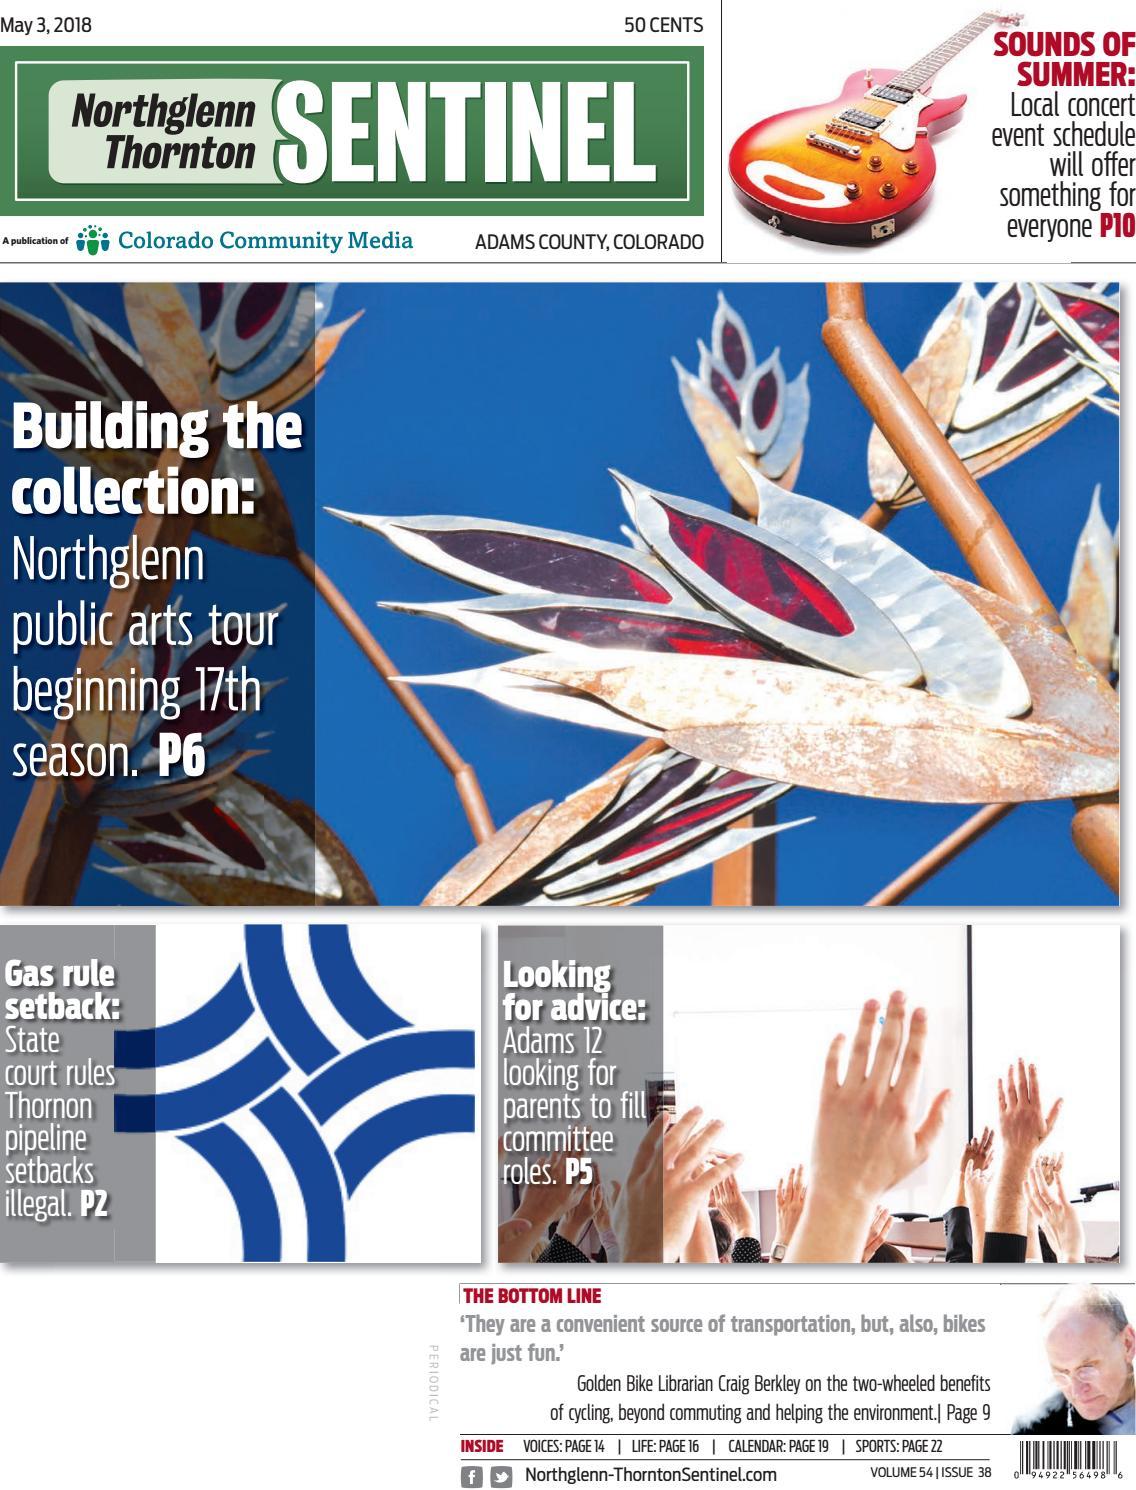 Northglenn thornton sentinel 0503 by colorado community media issuu